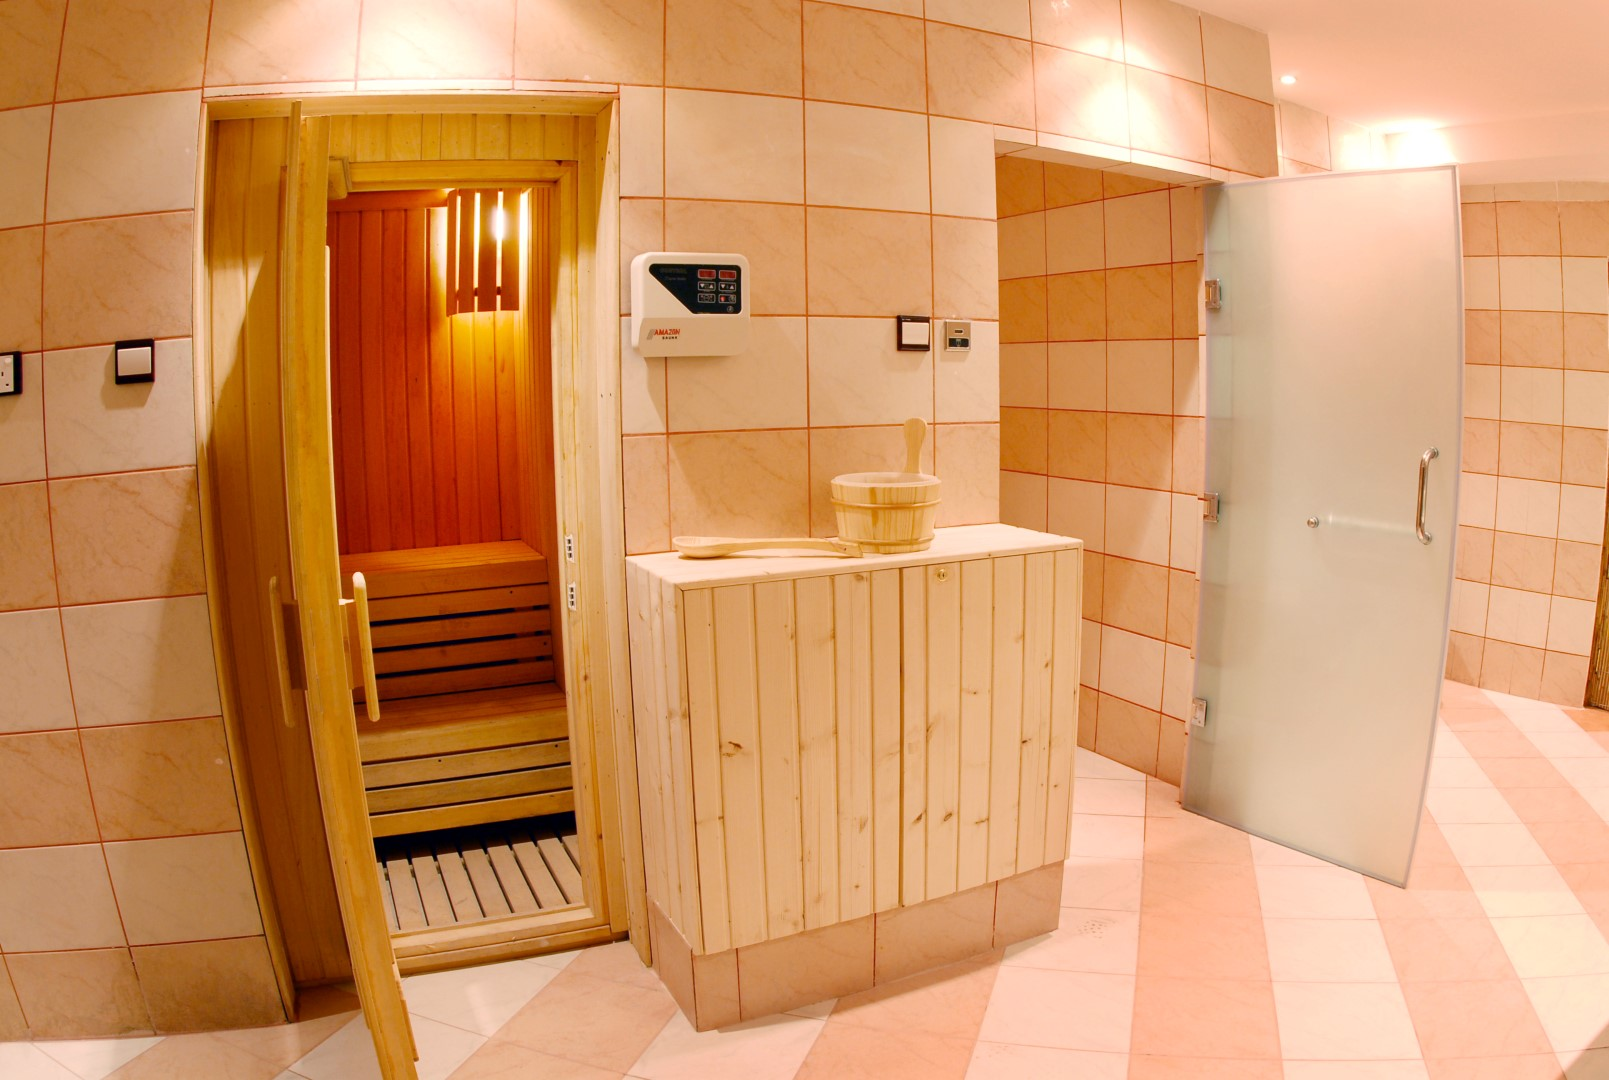 http://alliwansuites.com.qa/suites/wp-content/uploads/2016/06/Sauna-Steam2.jpg